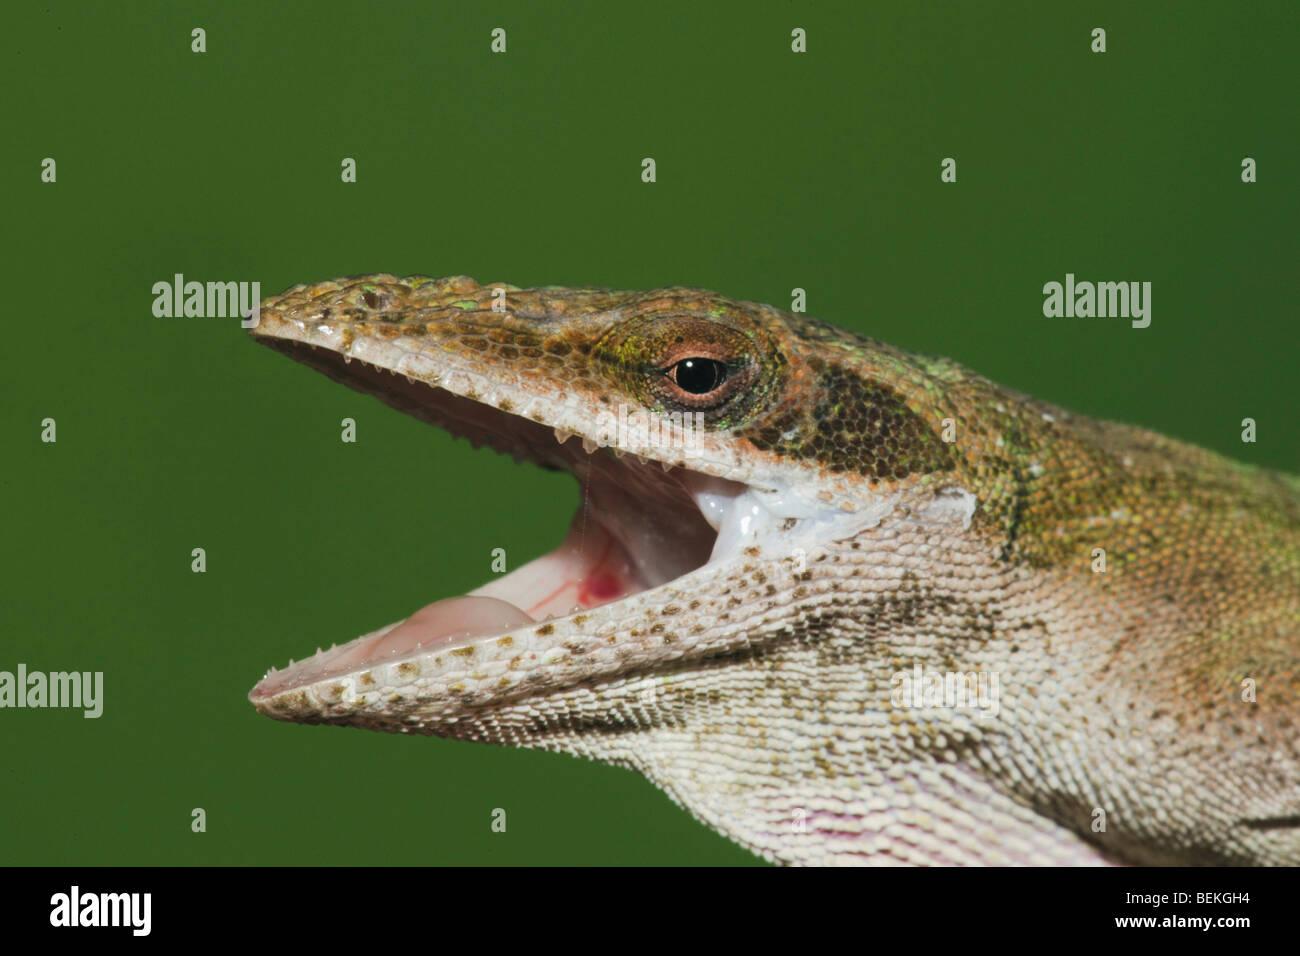 Green Anole (Anolis carolinensis), head, Sinton, Corpus Christi, Coastal Bend, Texas, USA - Stock Image